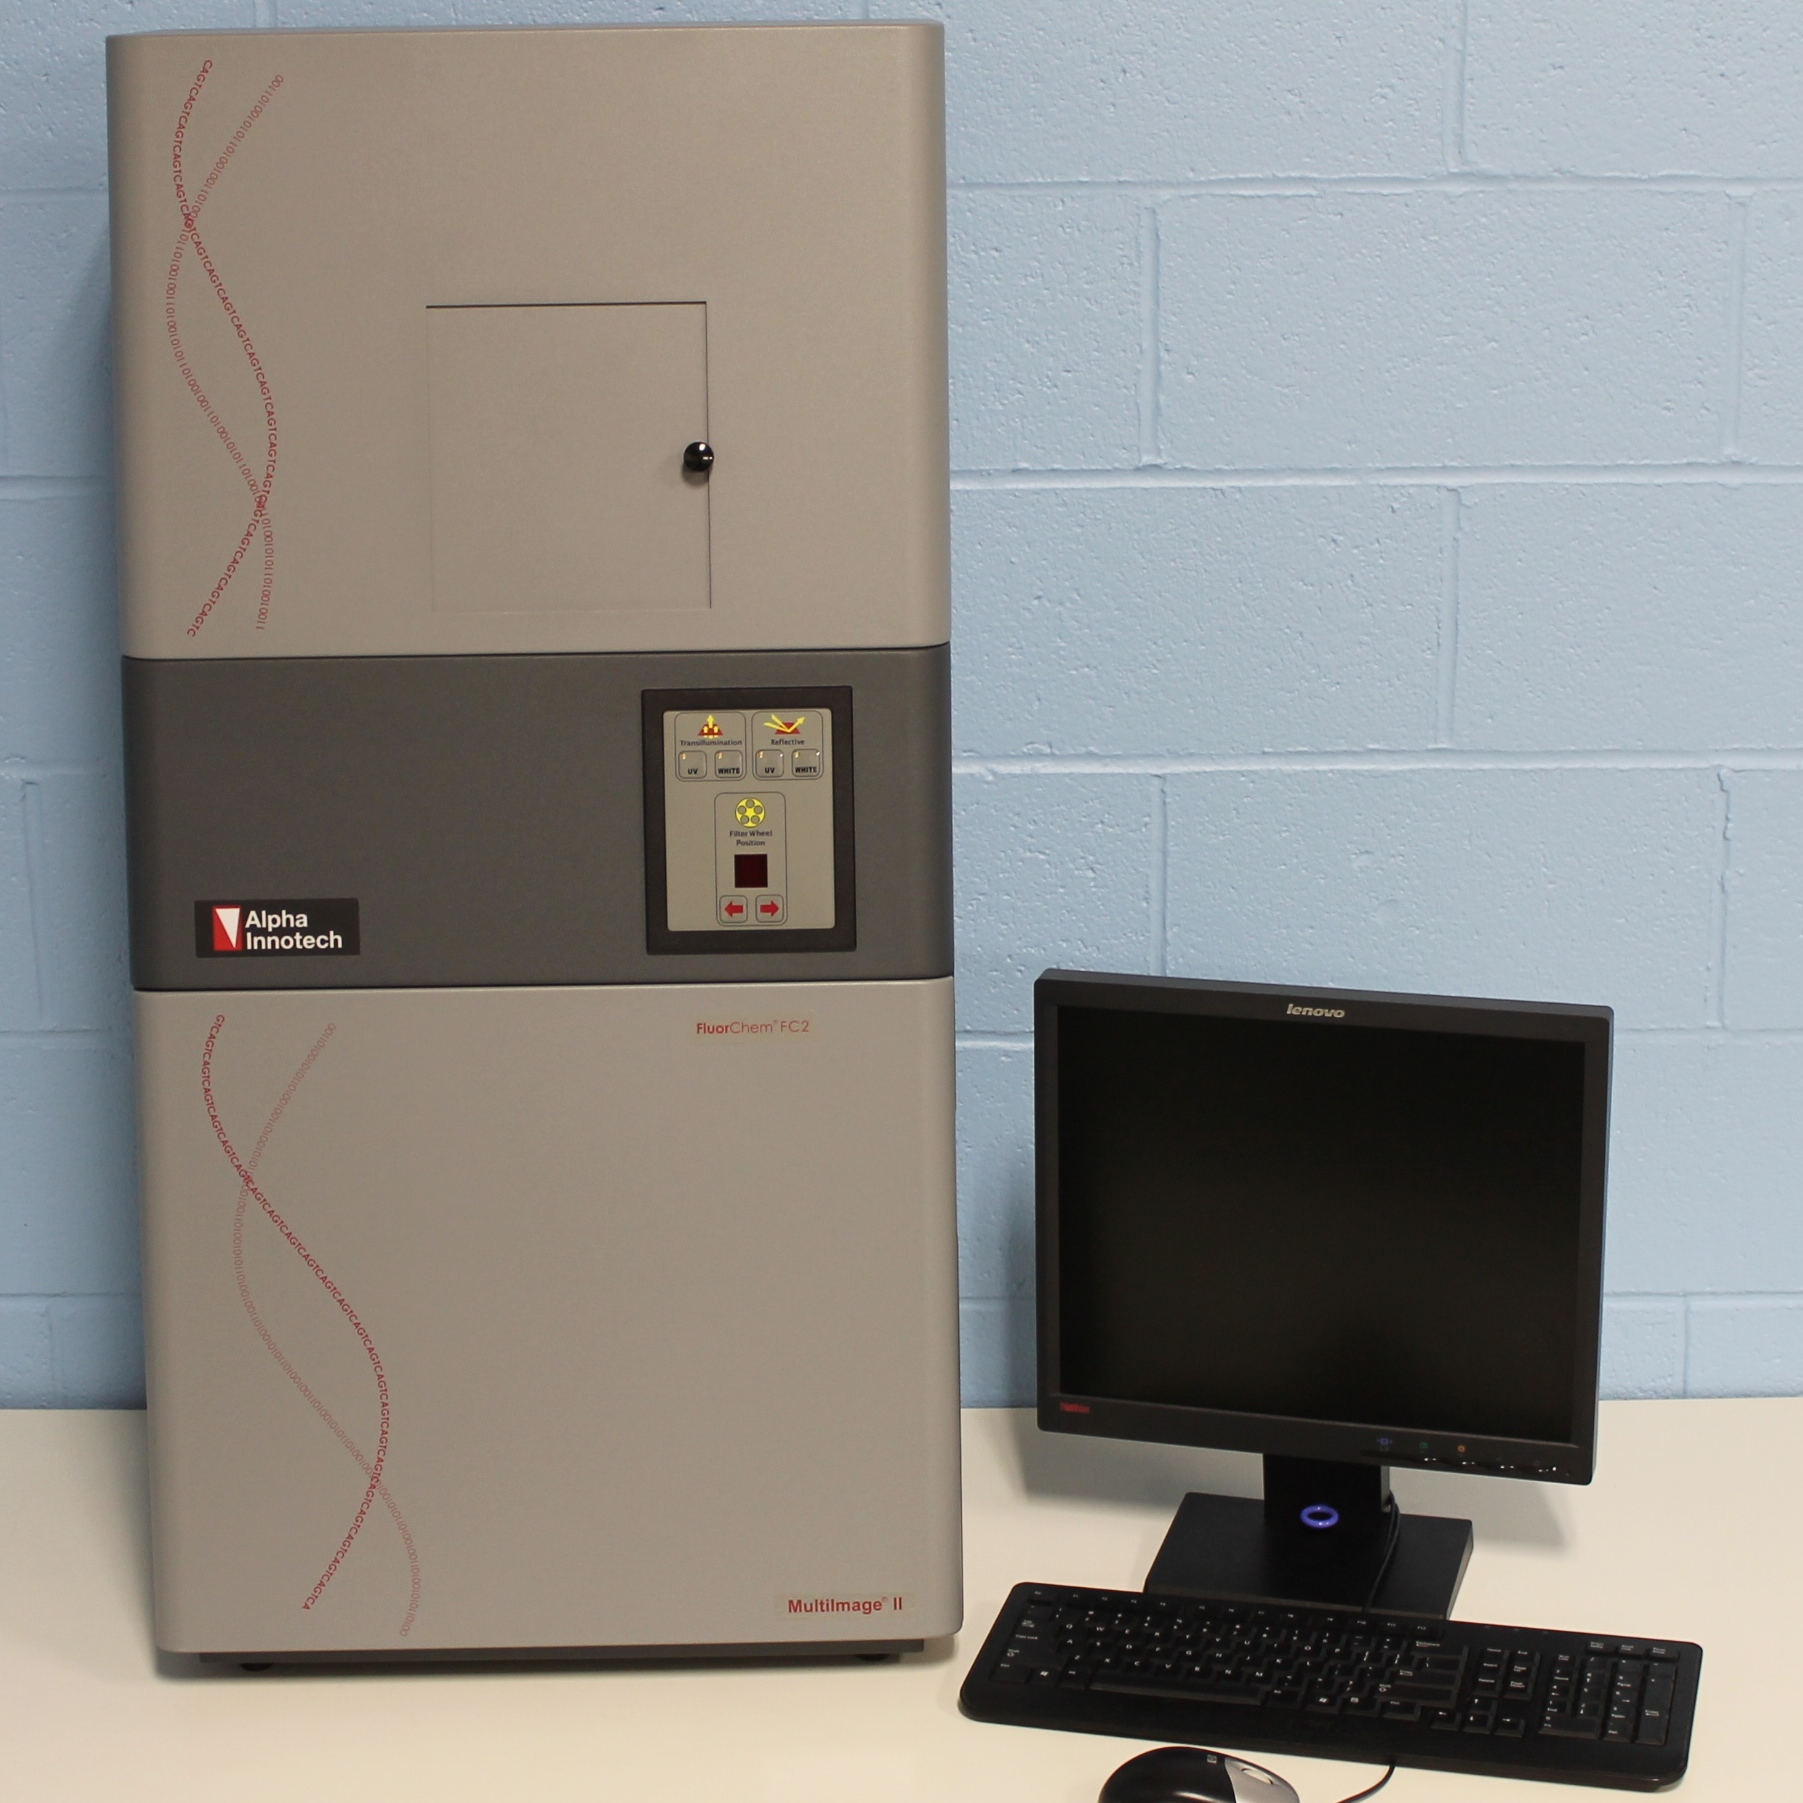 Alpha Innotech FluorChem FC2 Imaging System Image